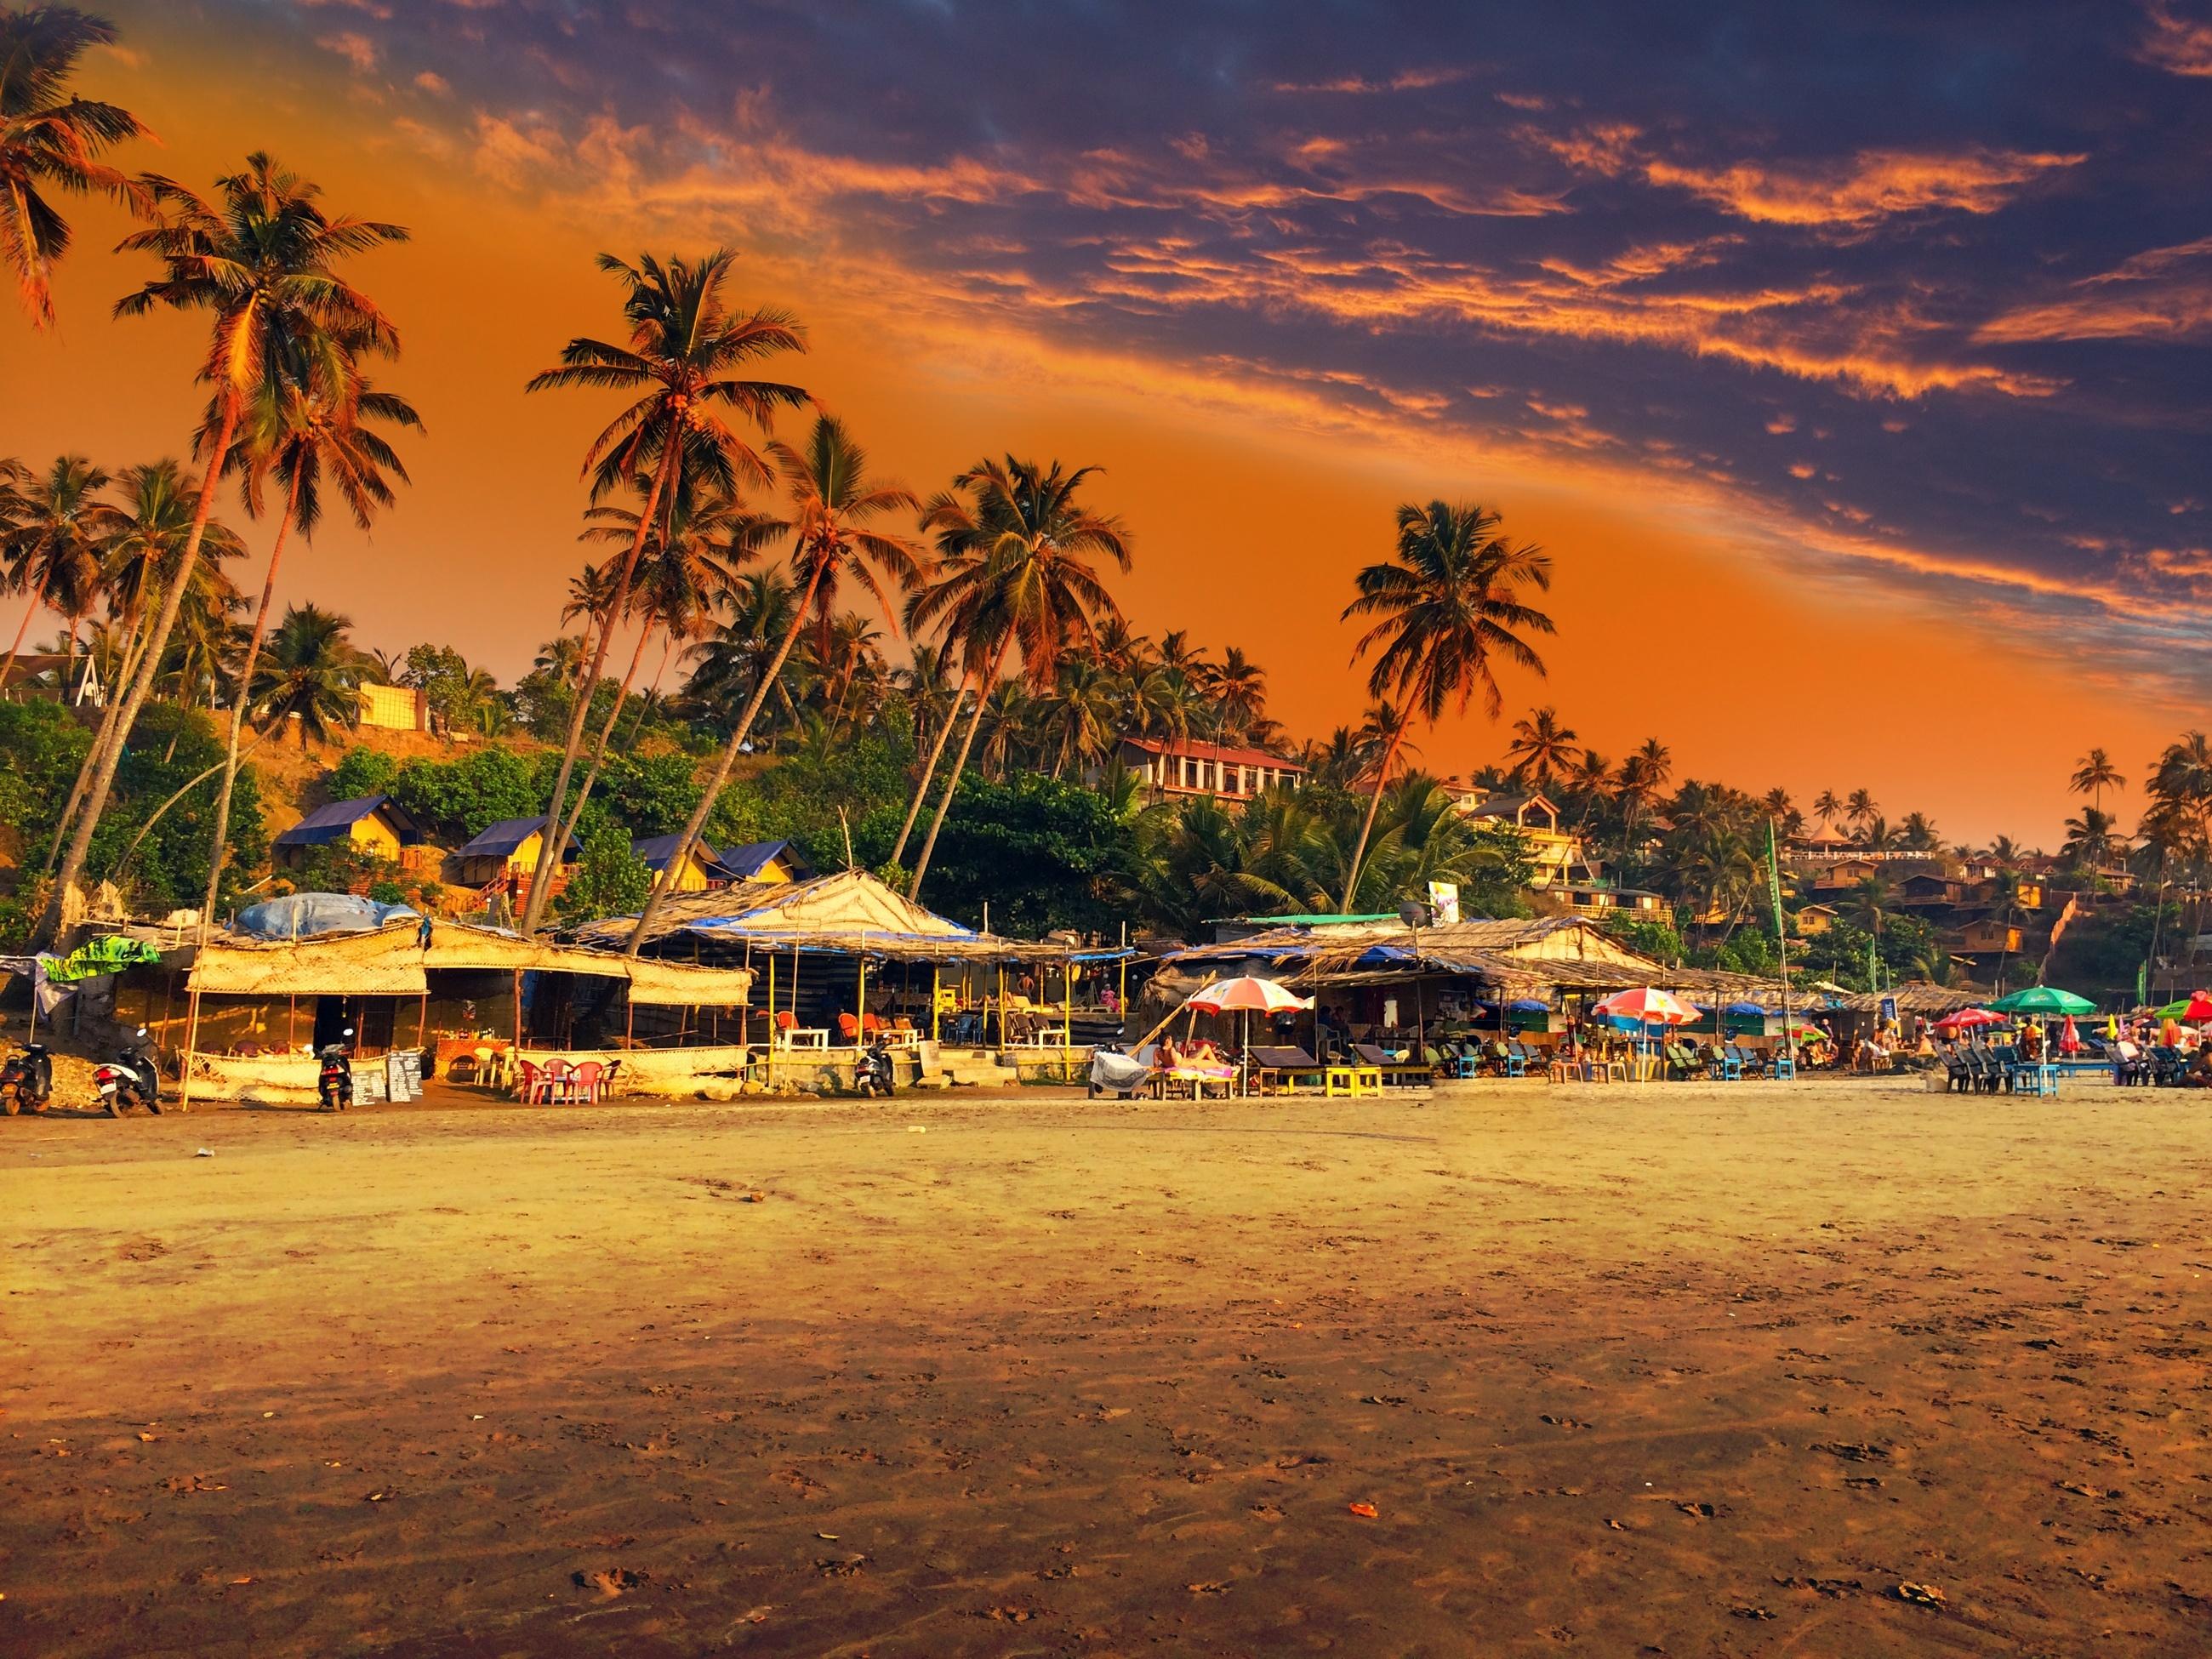 Big india. goa. beach on a sunset